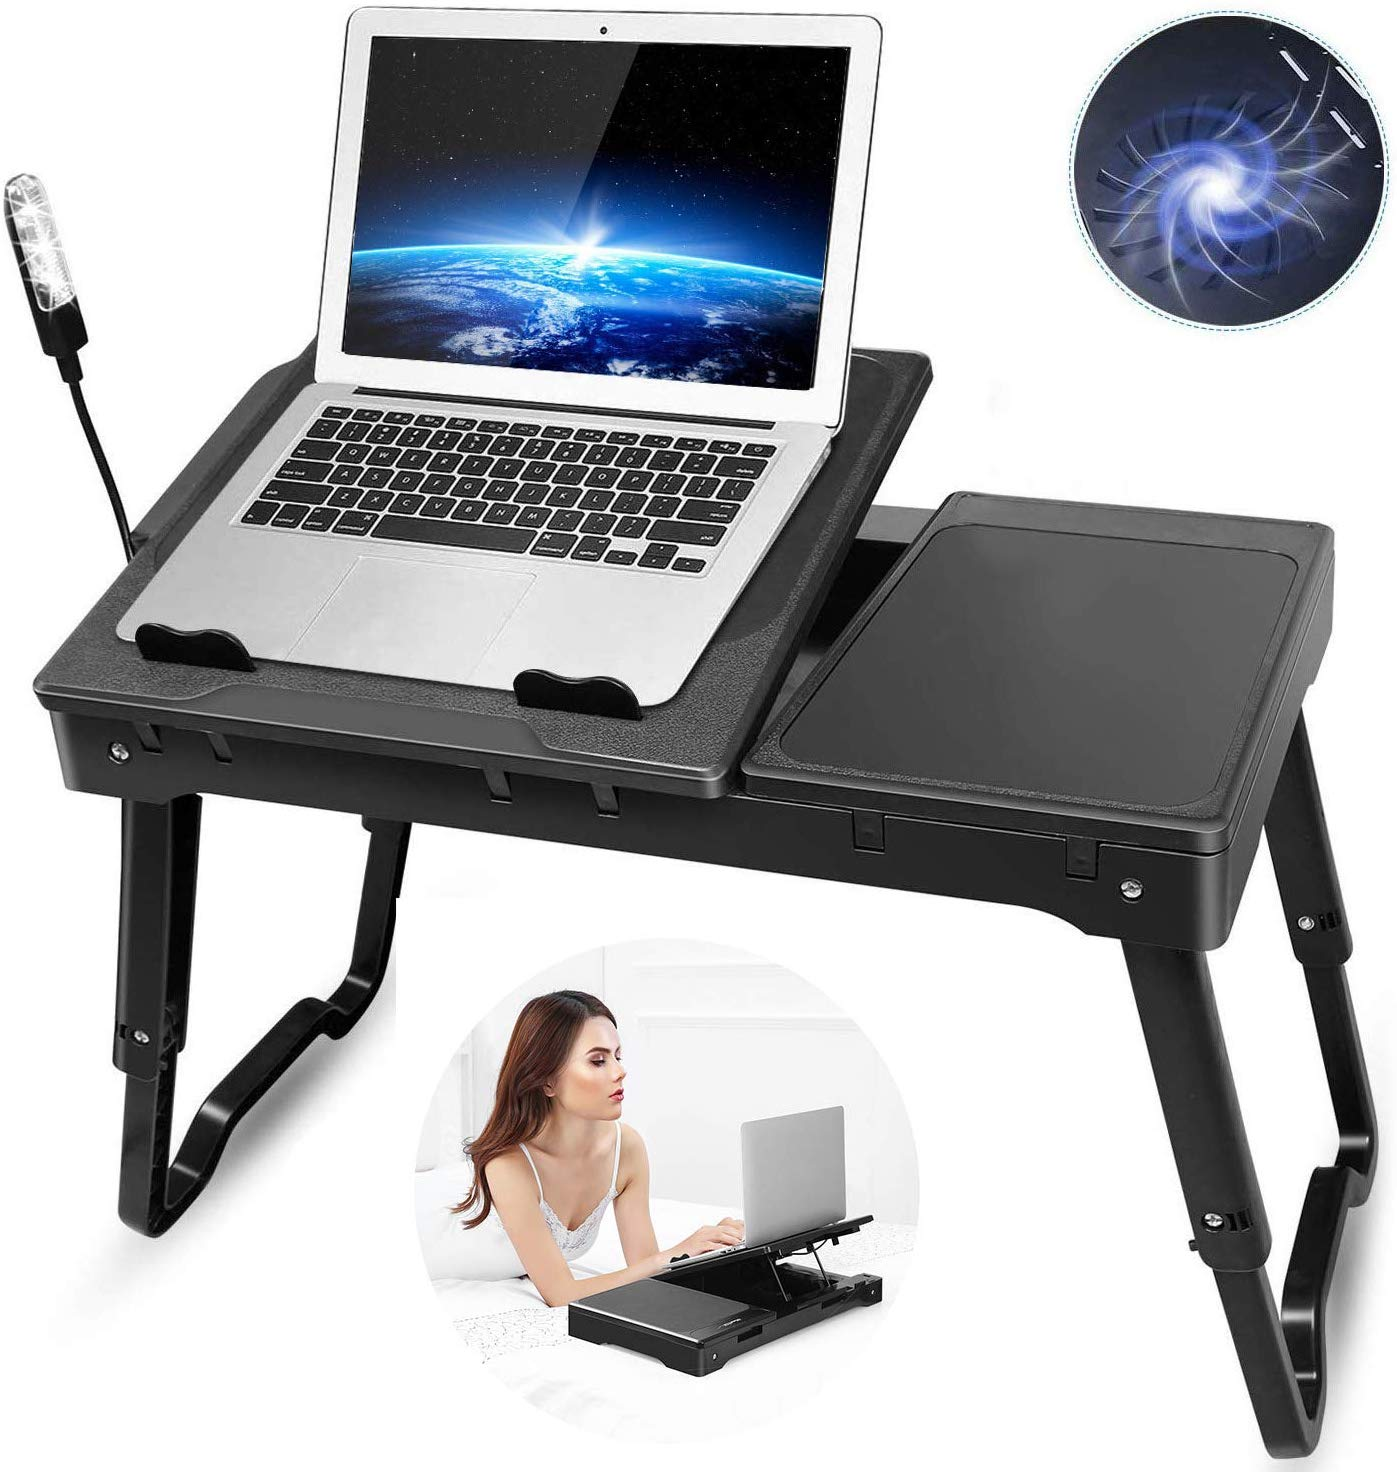 GPCT Lap Table - iMounTEK